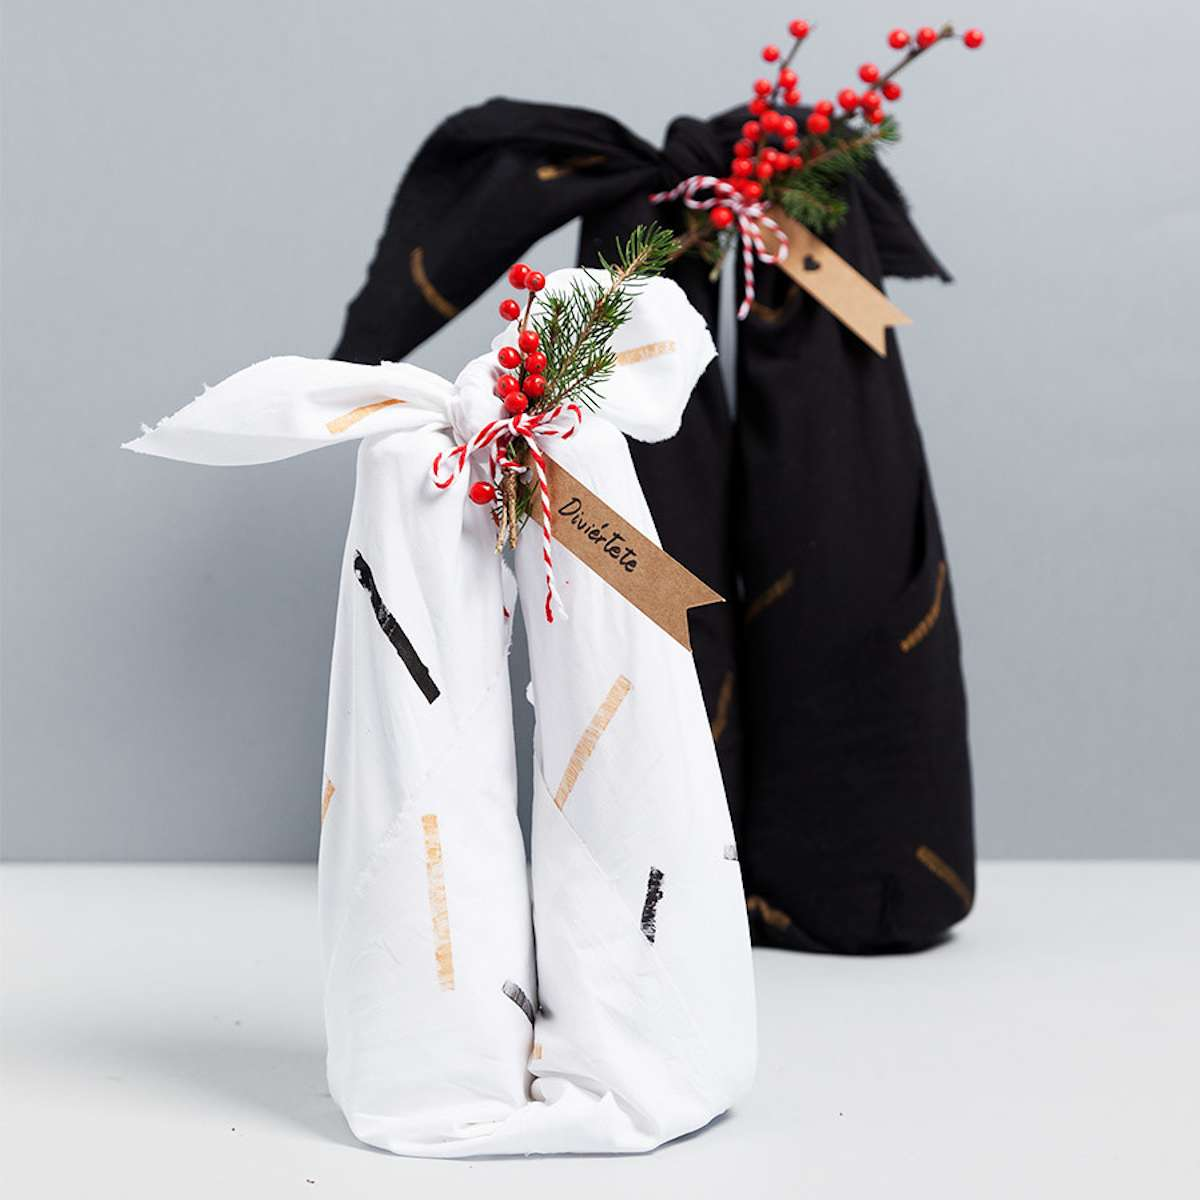 Diferentes maneras de envolver regalos con Furoshiki 6